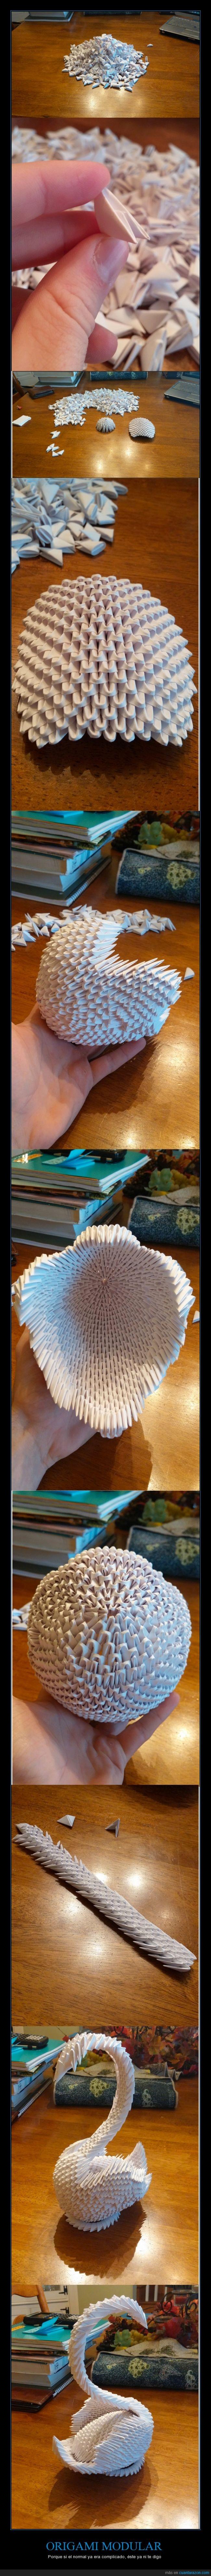 alas,arte,ave,cisne,complicado,modular,origami,papiroflexia,pato